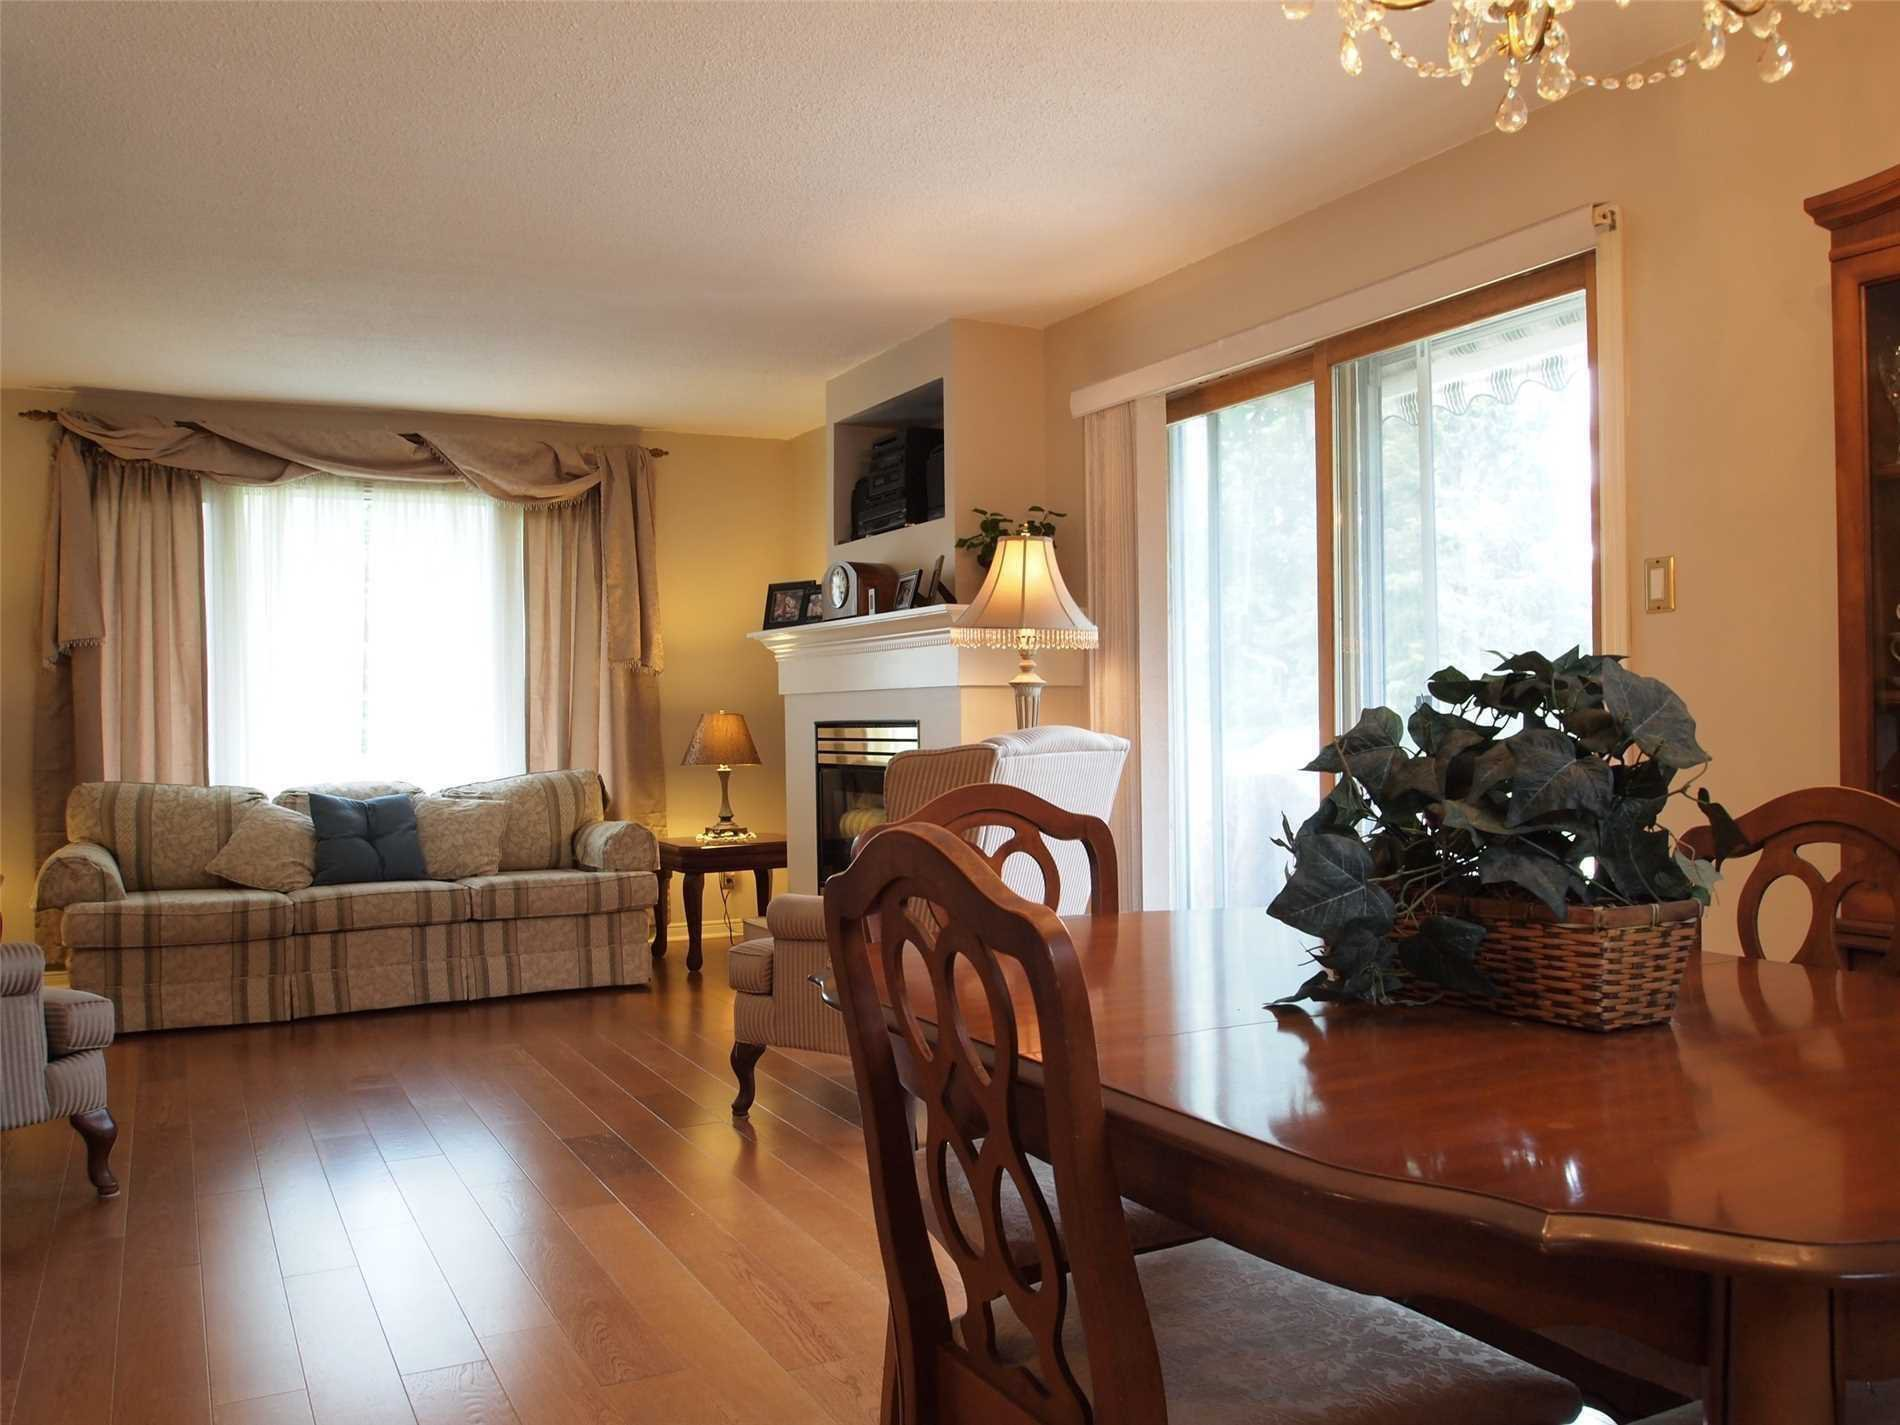 Photo 10: Photos: 105 Fifth Street in Brock: Beaverton House (Bungalow) for sale : MLS®# N4564596